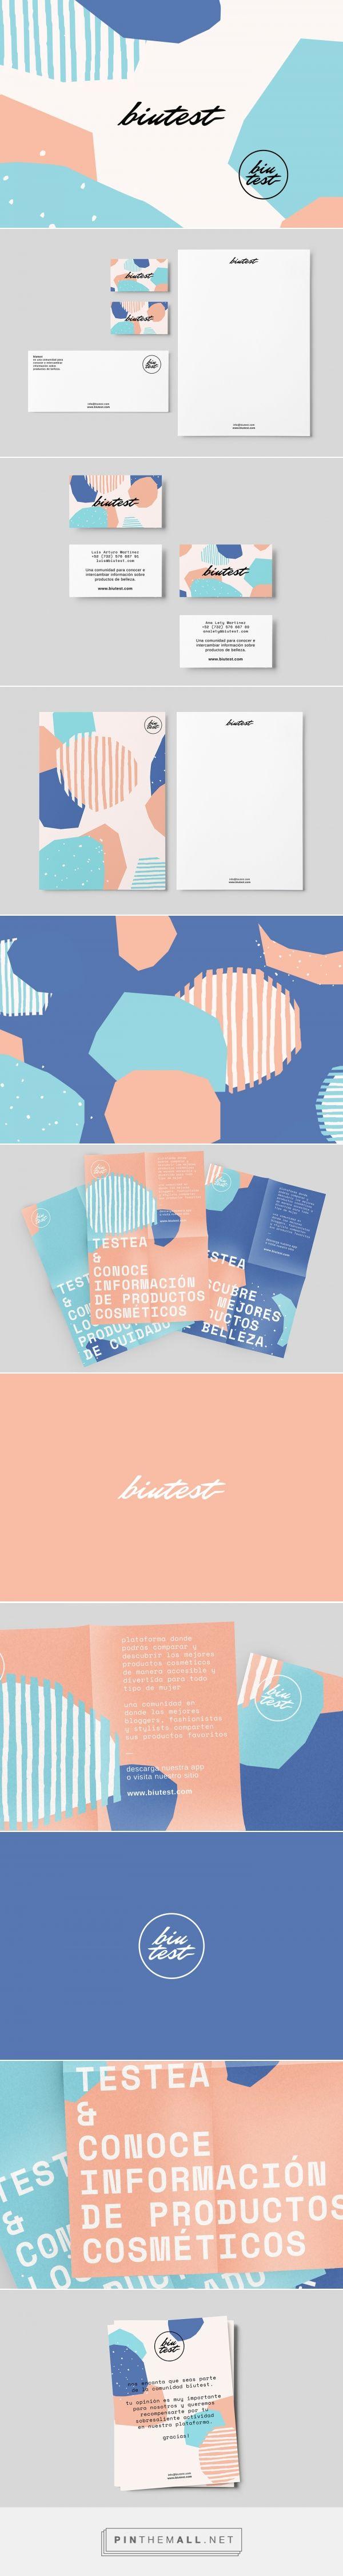 BIUTEST Online Beauty Community Branding by Dum Dum Design Office   Fivestar Branding Agency – Design and Branding Agency & Curated Inspiration Gallery